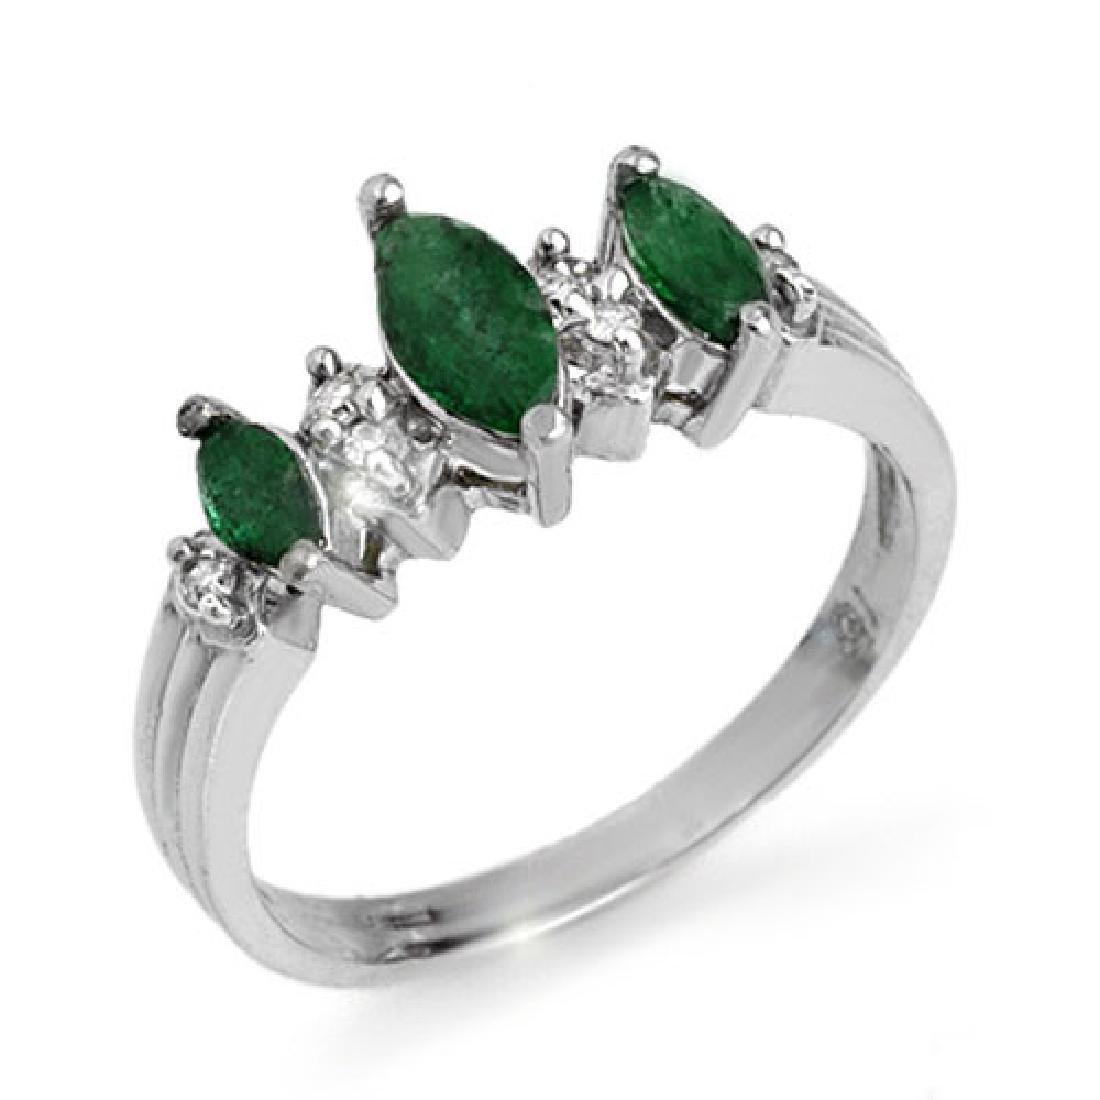 1.0 CTW Emerald & Diamond Ring 10K White Gold